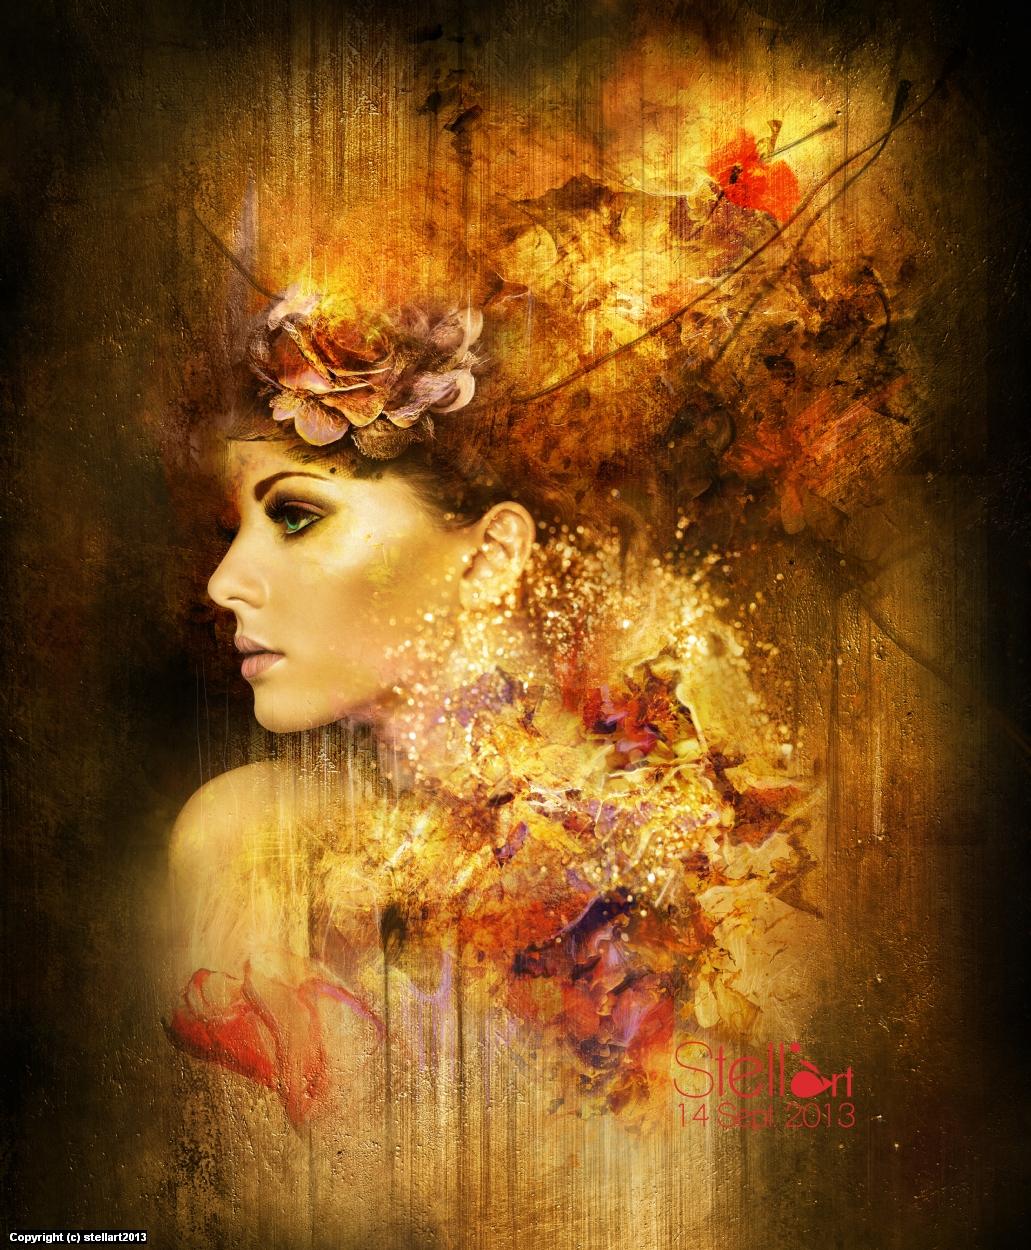 Poésie Artwork by Estelle Chomienne